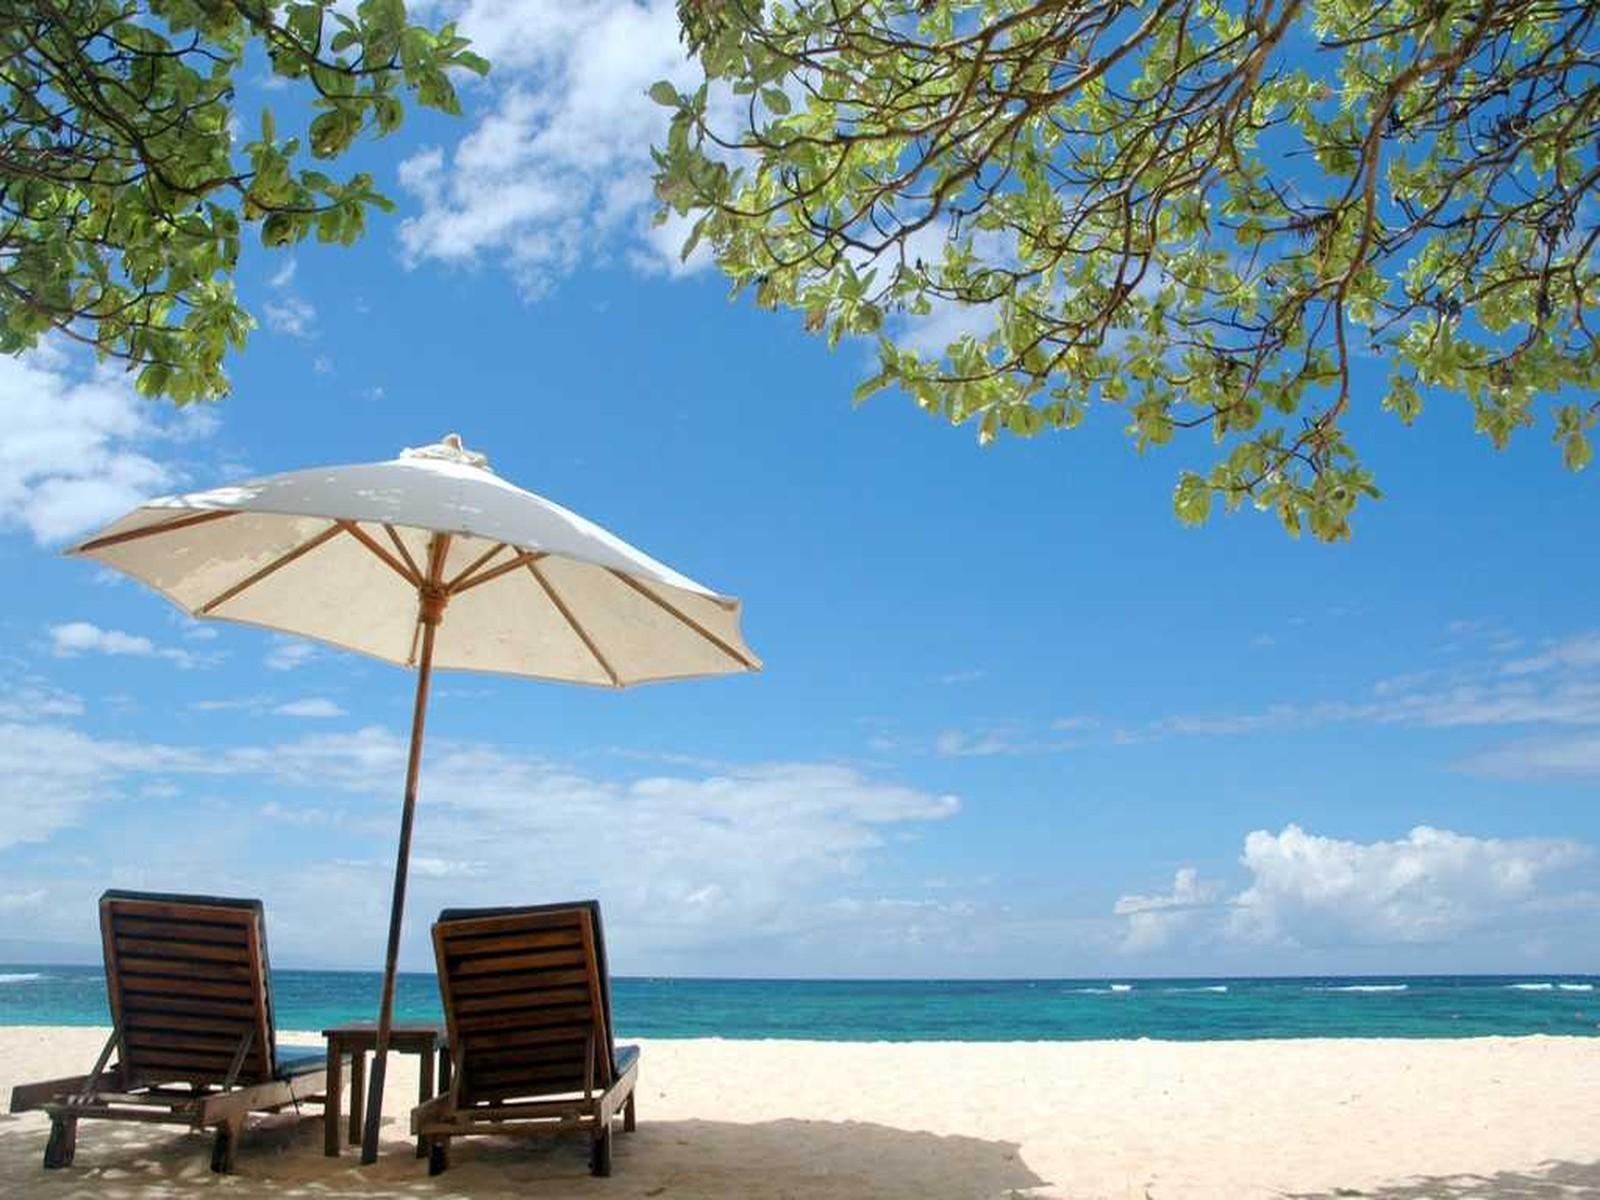 bali-beachesbali-villas-beach-holiday-villa-in-bali-nfqqg0od